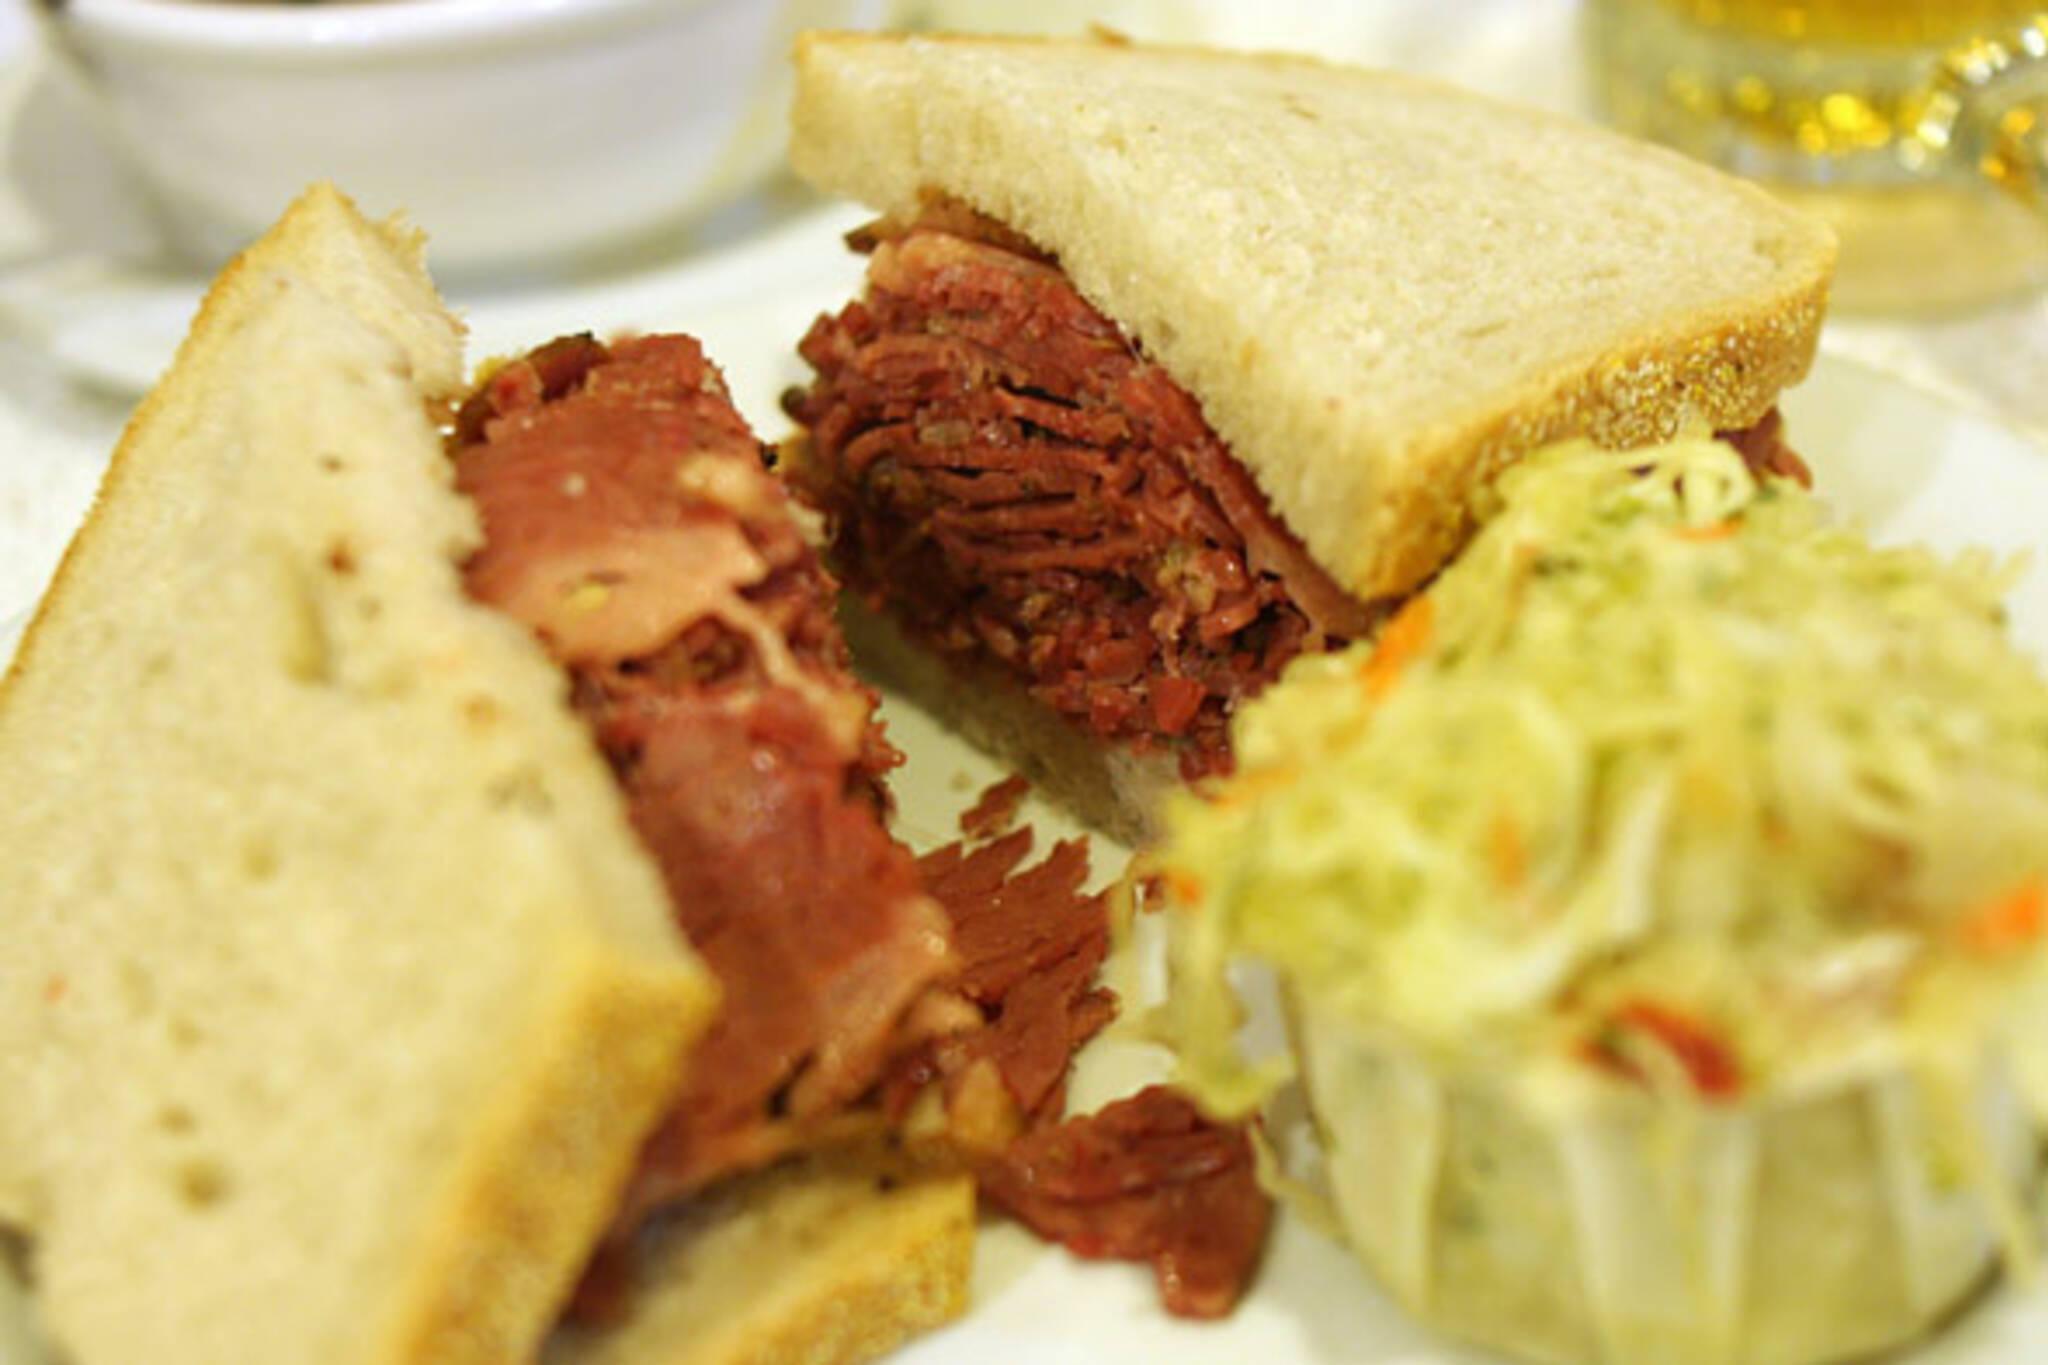 Pastrami Sandwich at Yitz's Deli